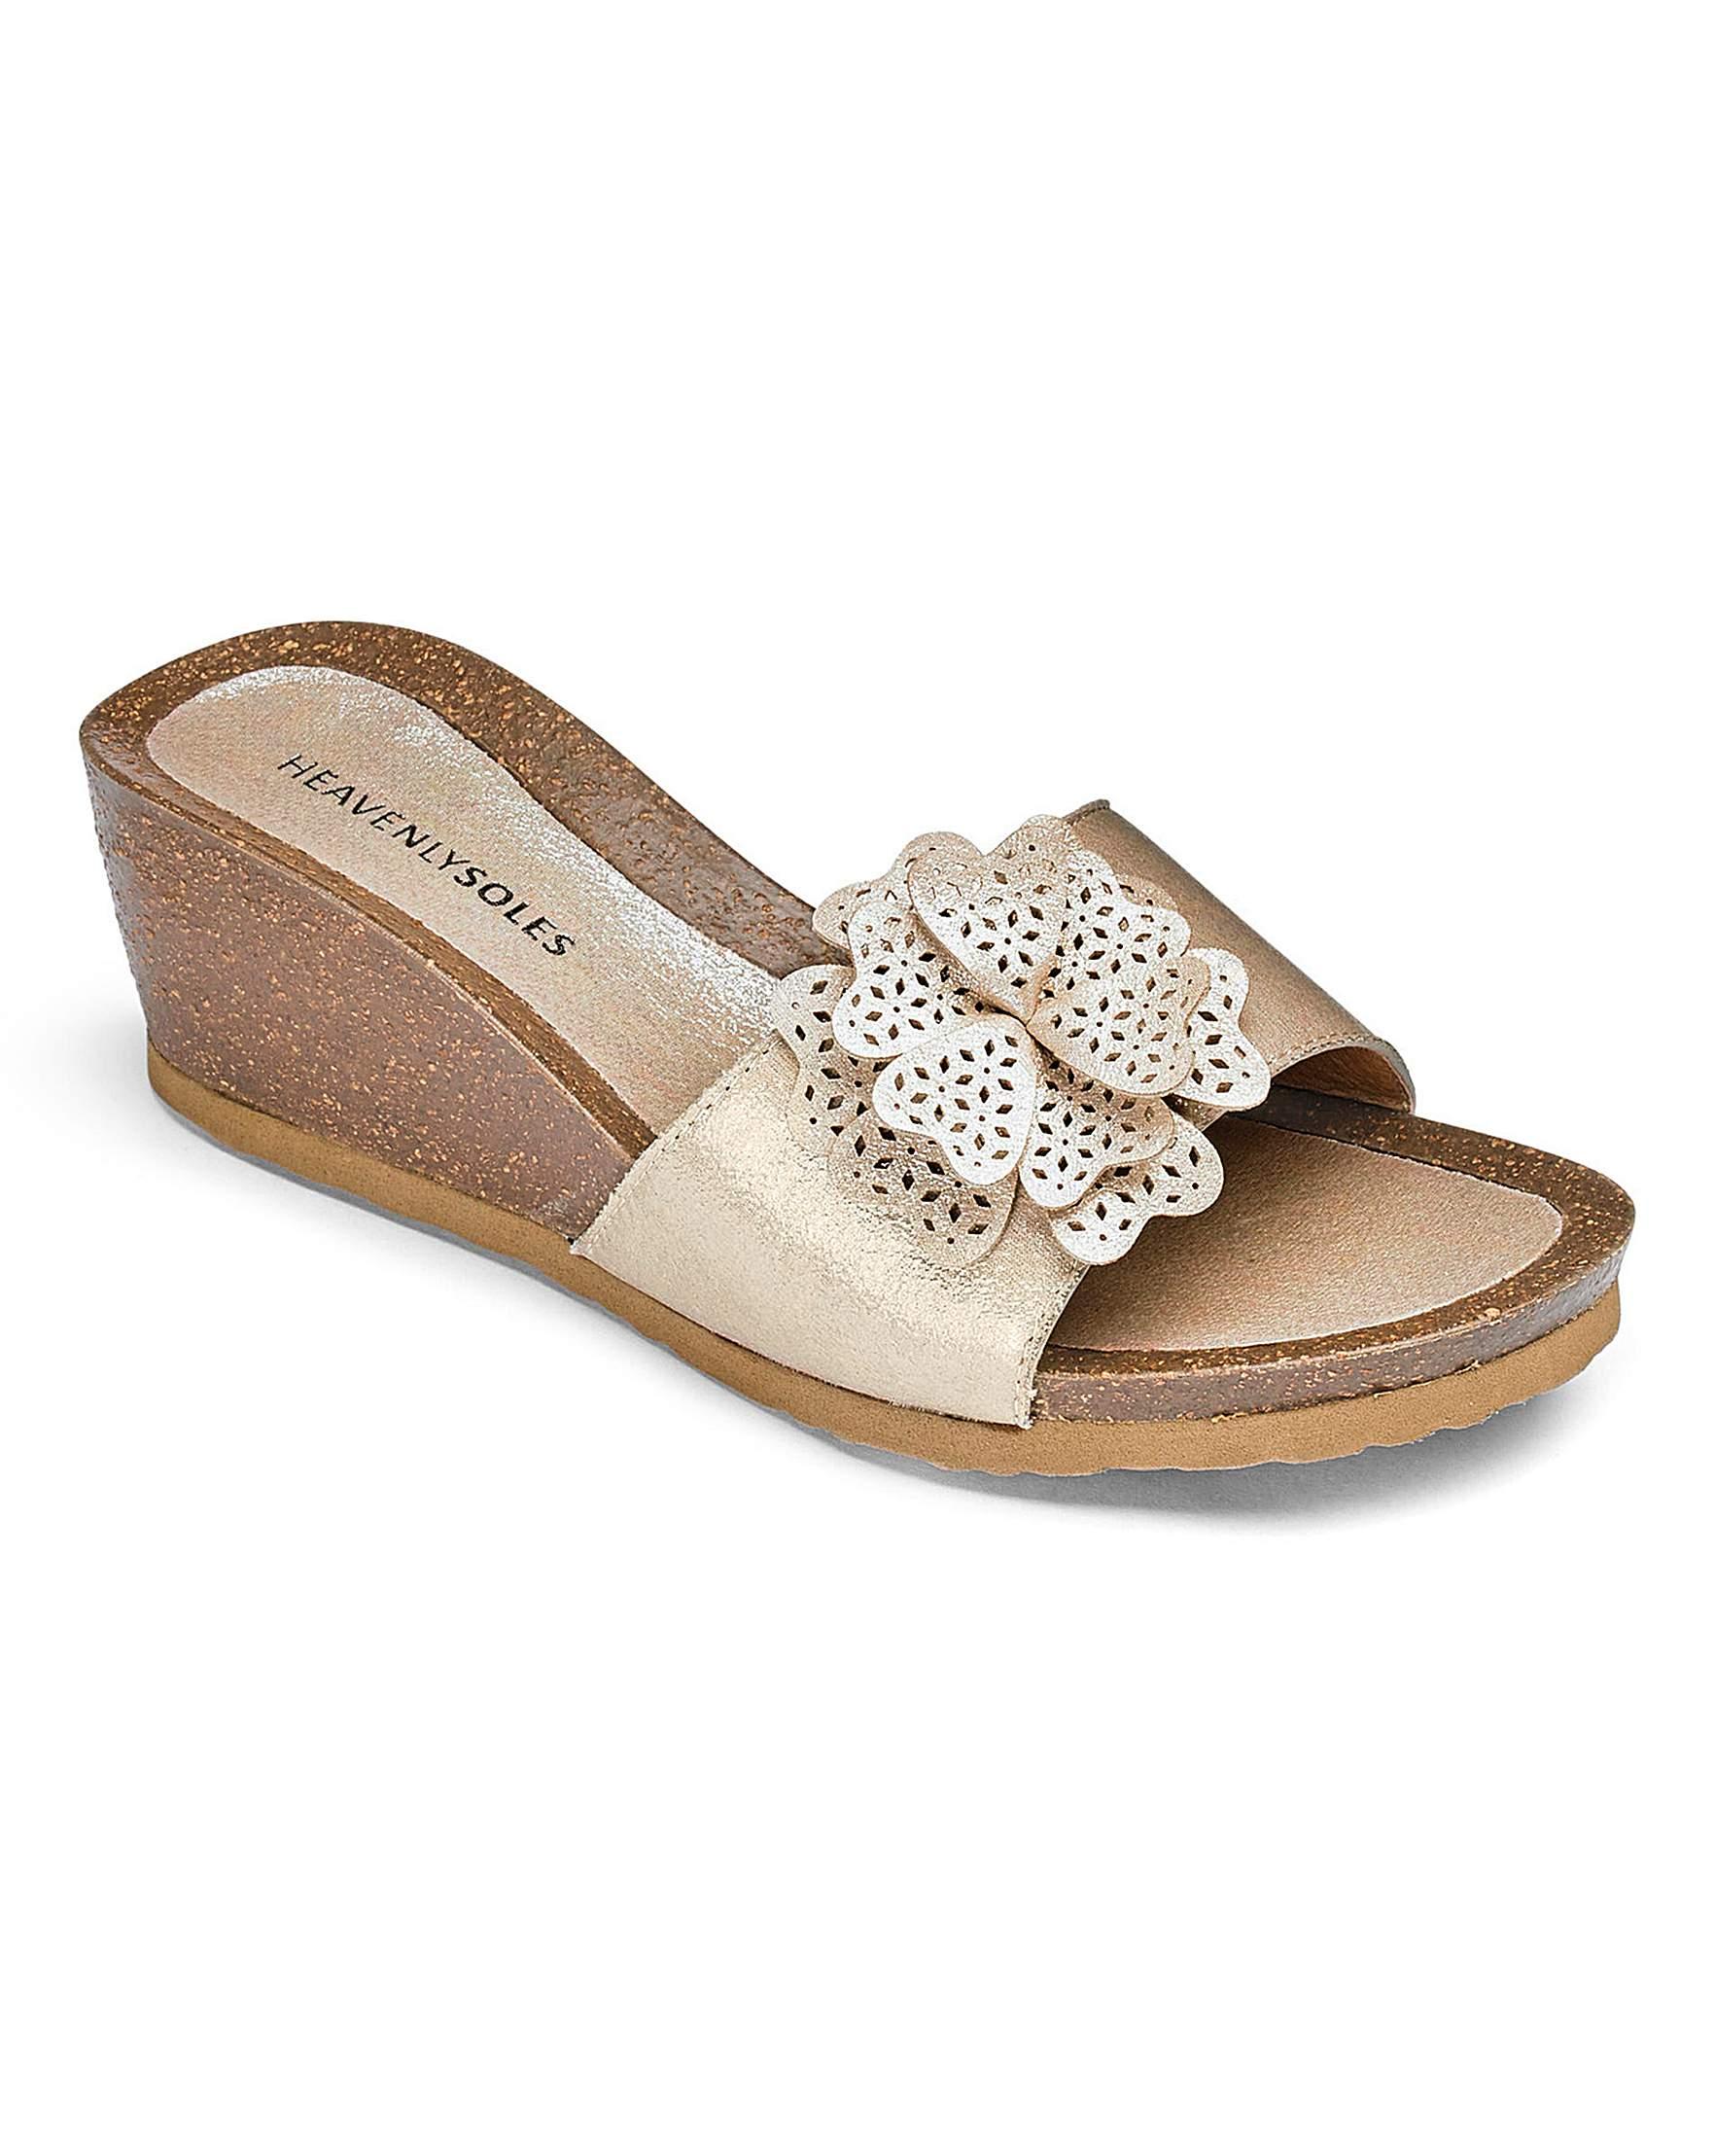 Wide fit sandals shoes uk - Heavenly Soles Wedge Sandals E Fit